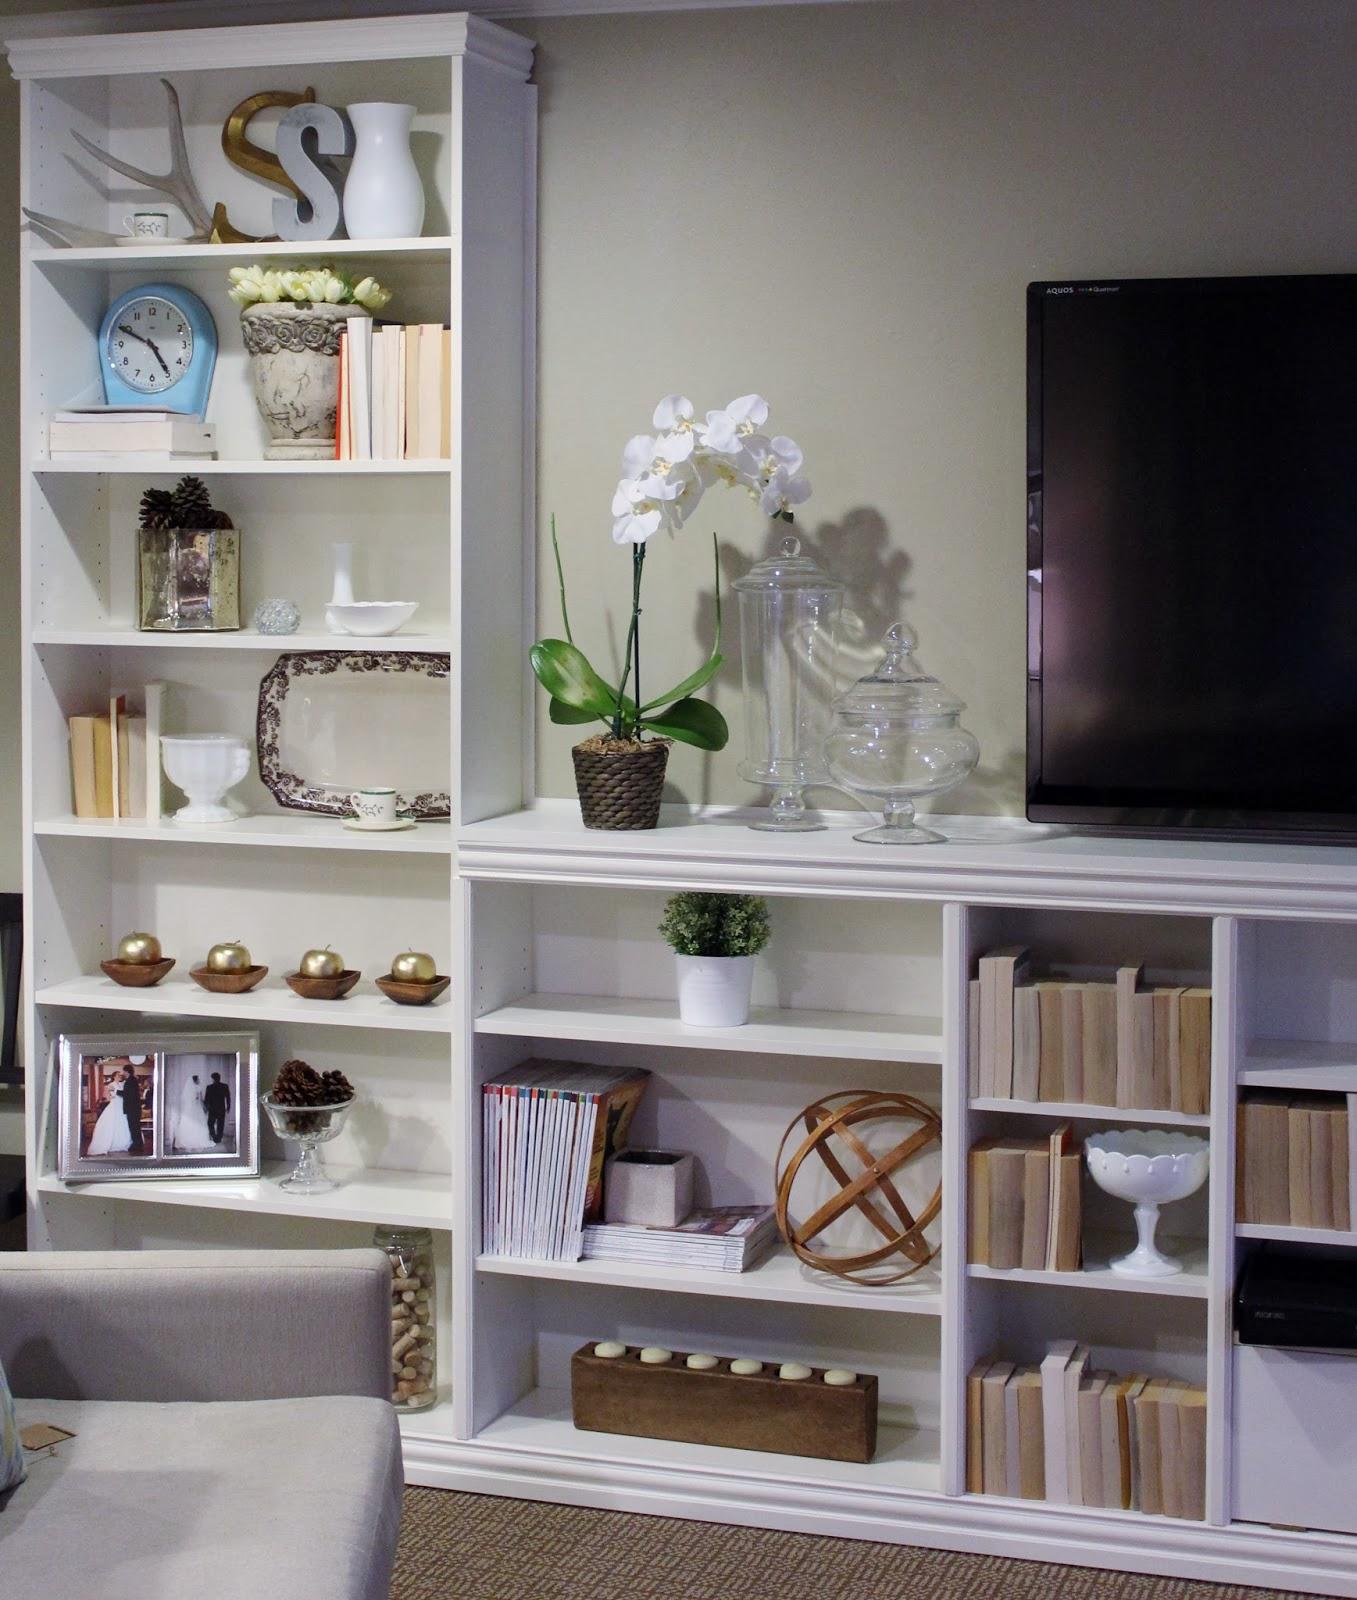 Built In Bookshelve: Elementary Organization: Billy Bookcase Built-in Bonanza